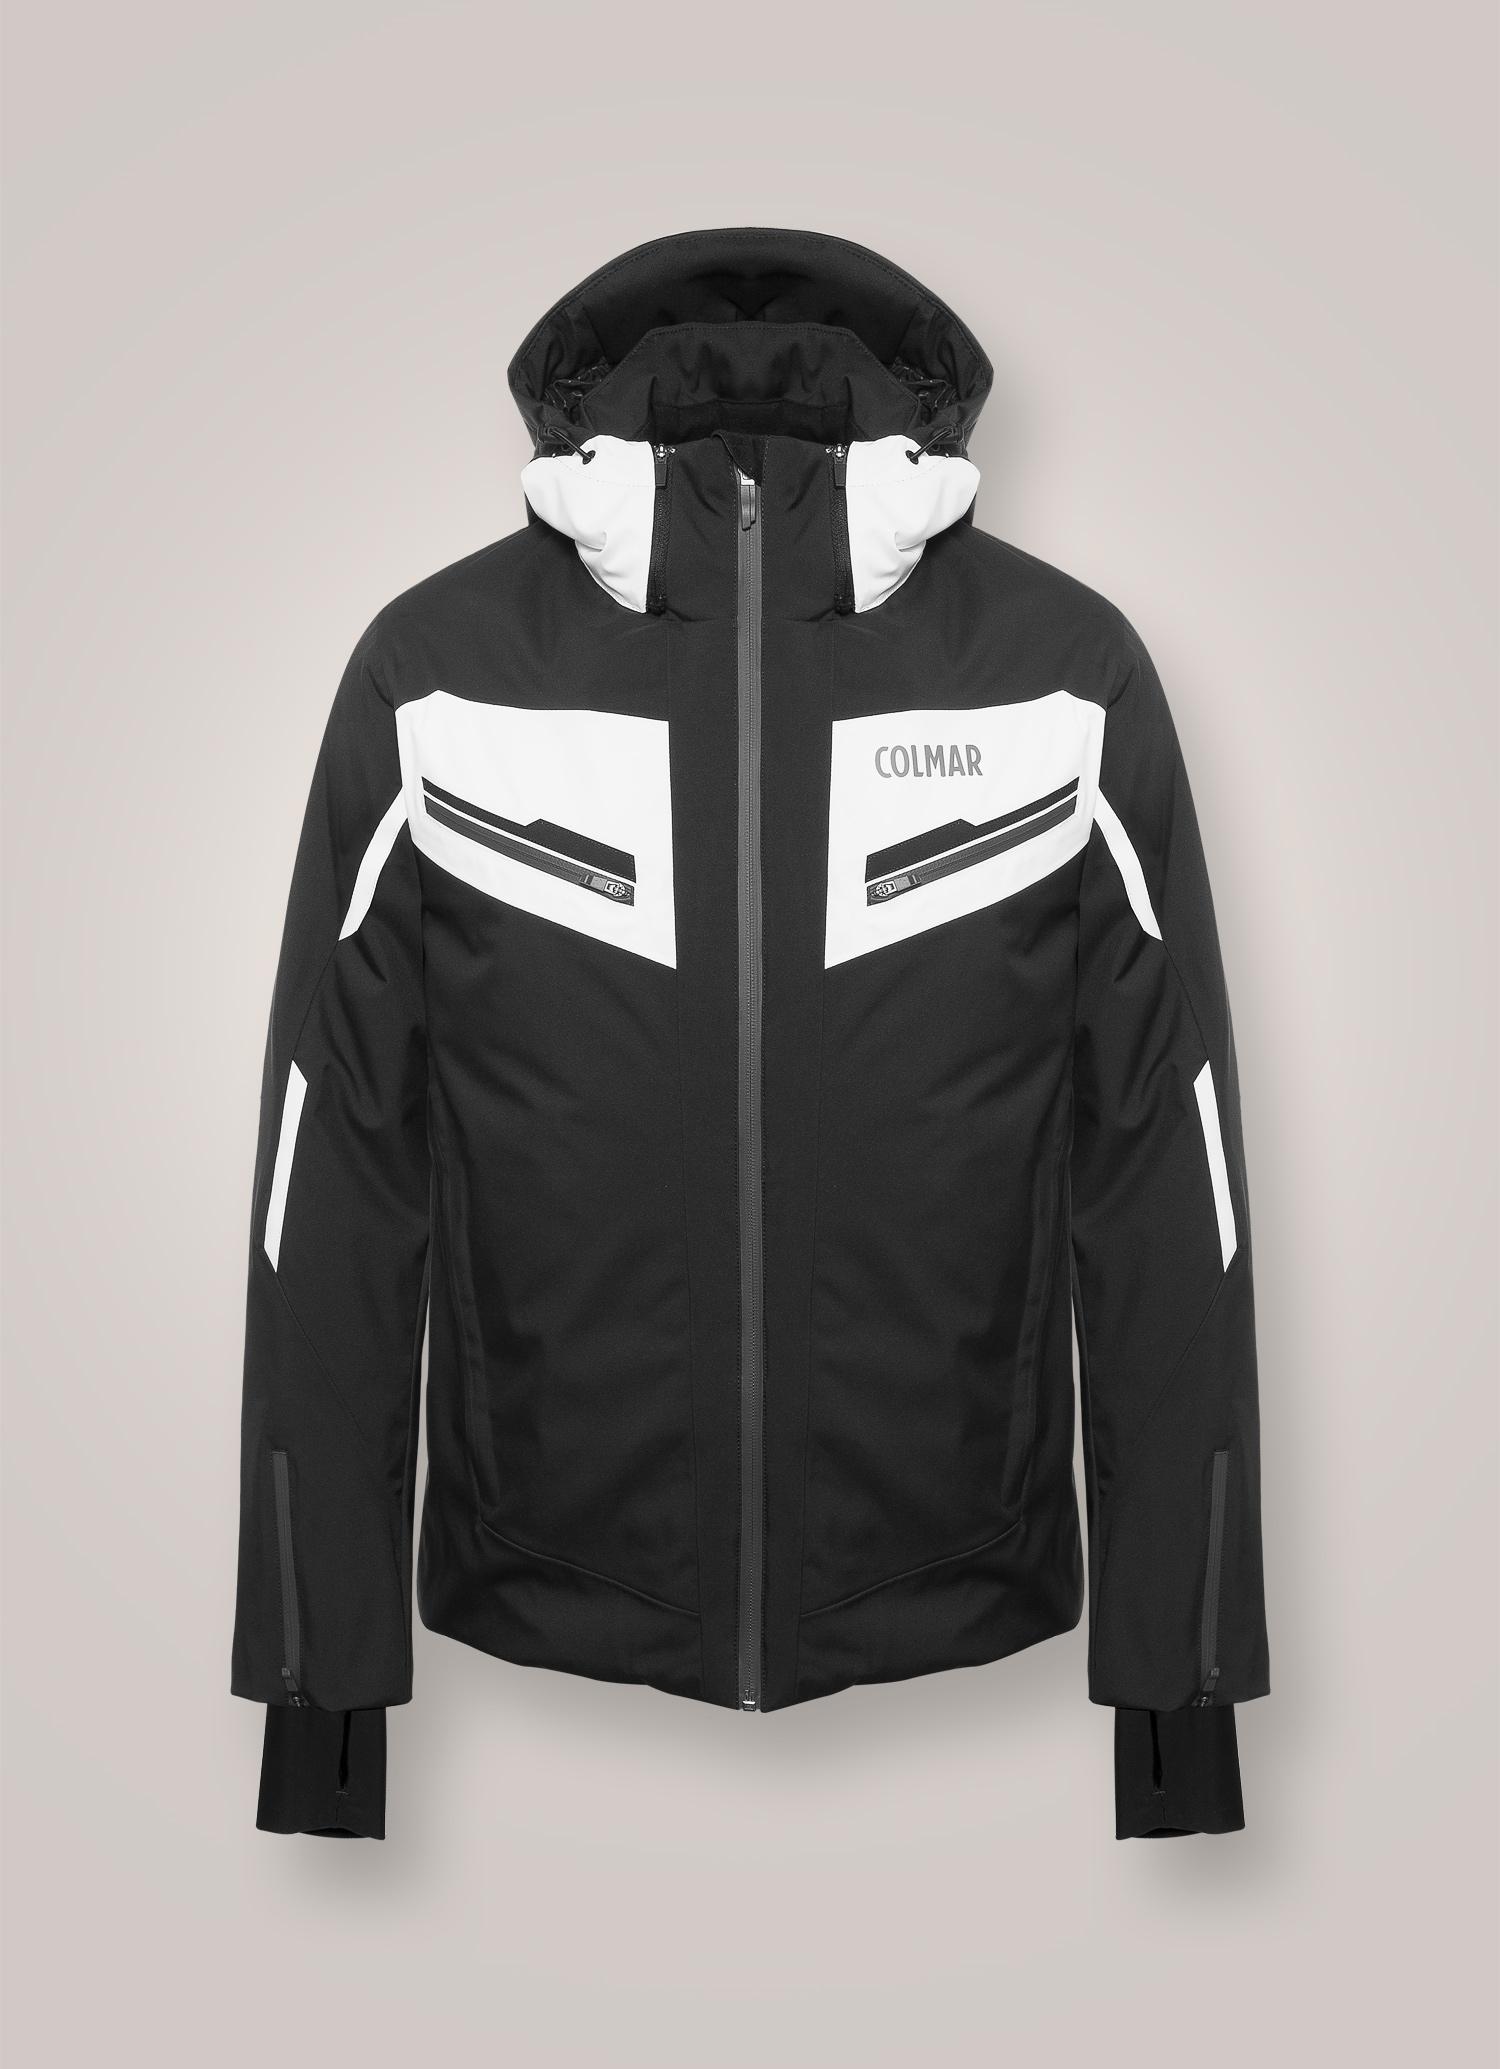 c4315572d617 Pánska lyžiarska bunda COLMAR Golden Eagle 1375 čierna model 2018 19